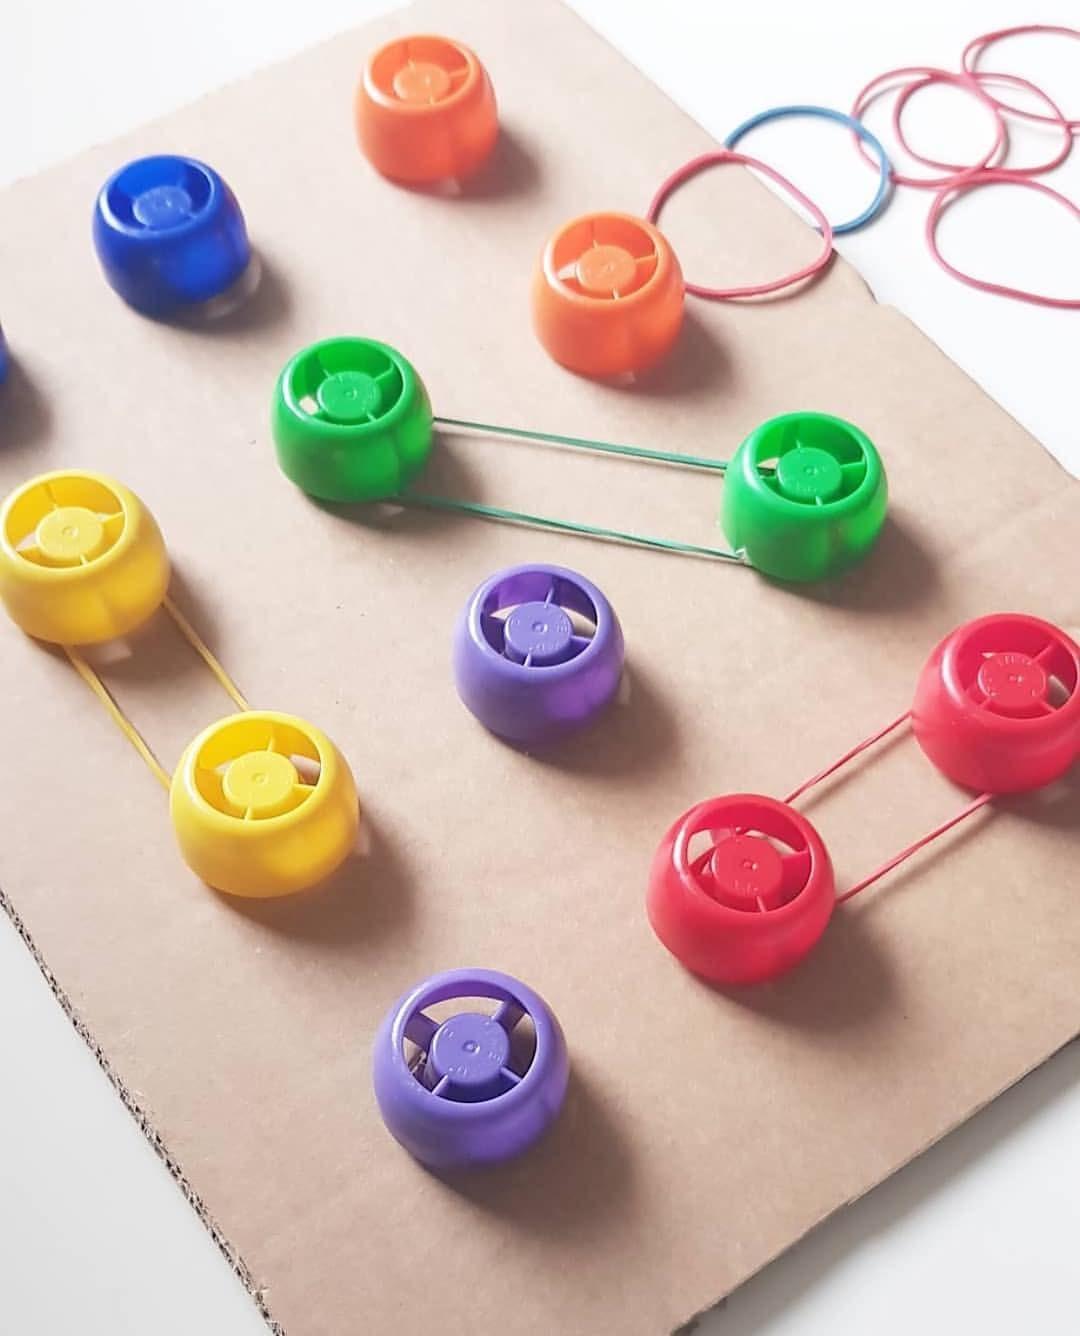 Mã Use Spielzeug Selber Bauen